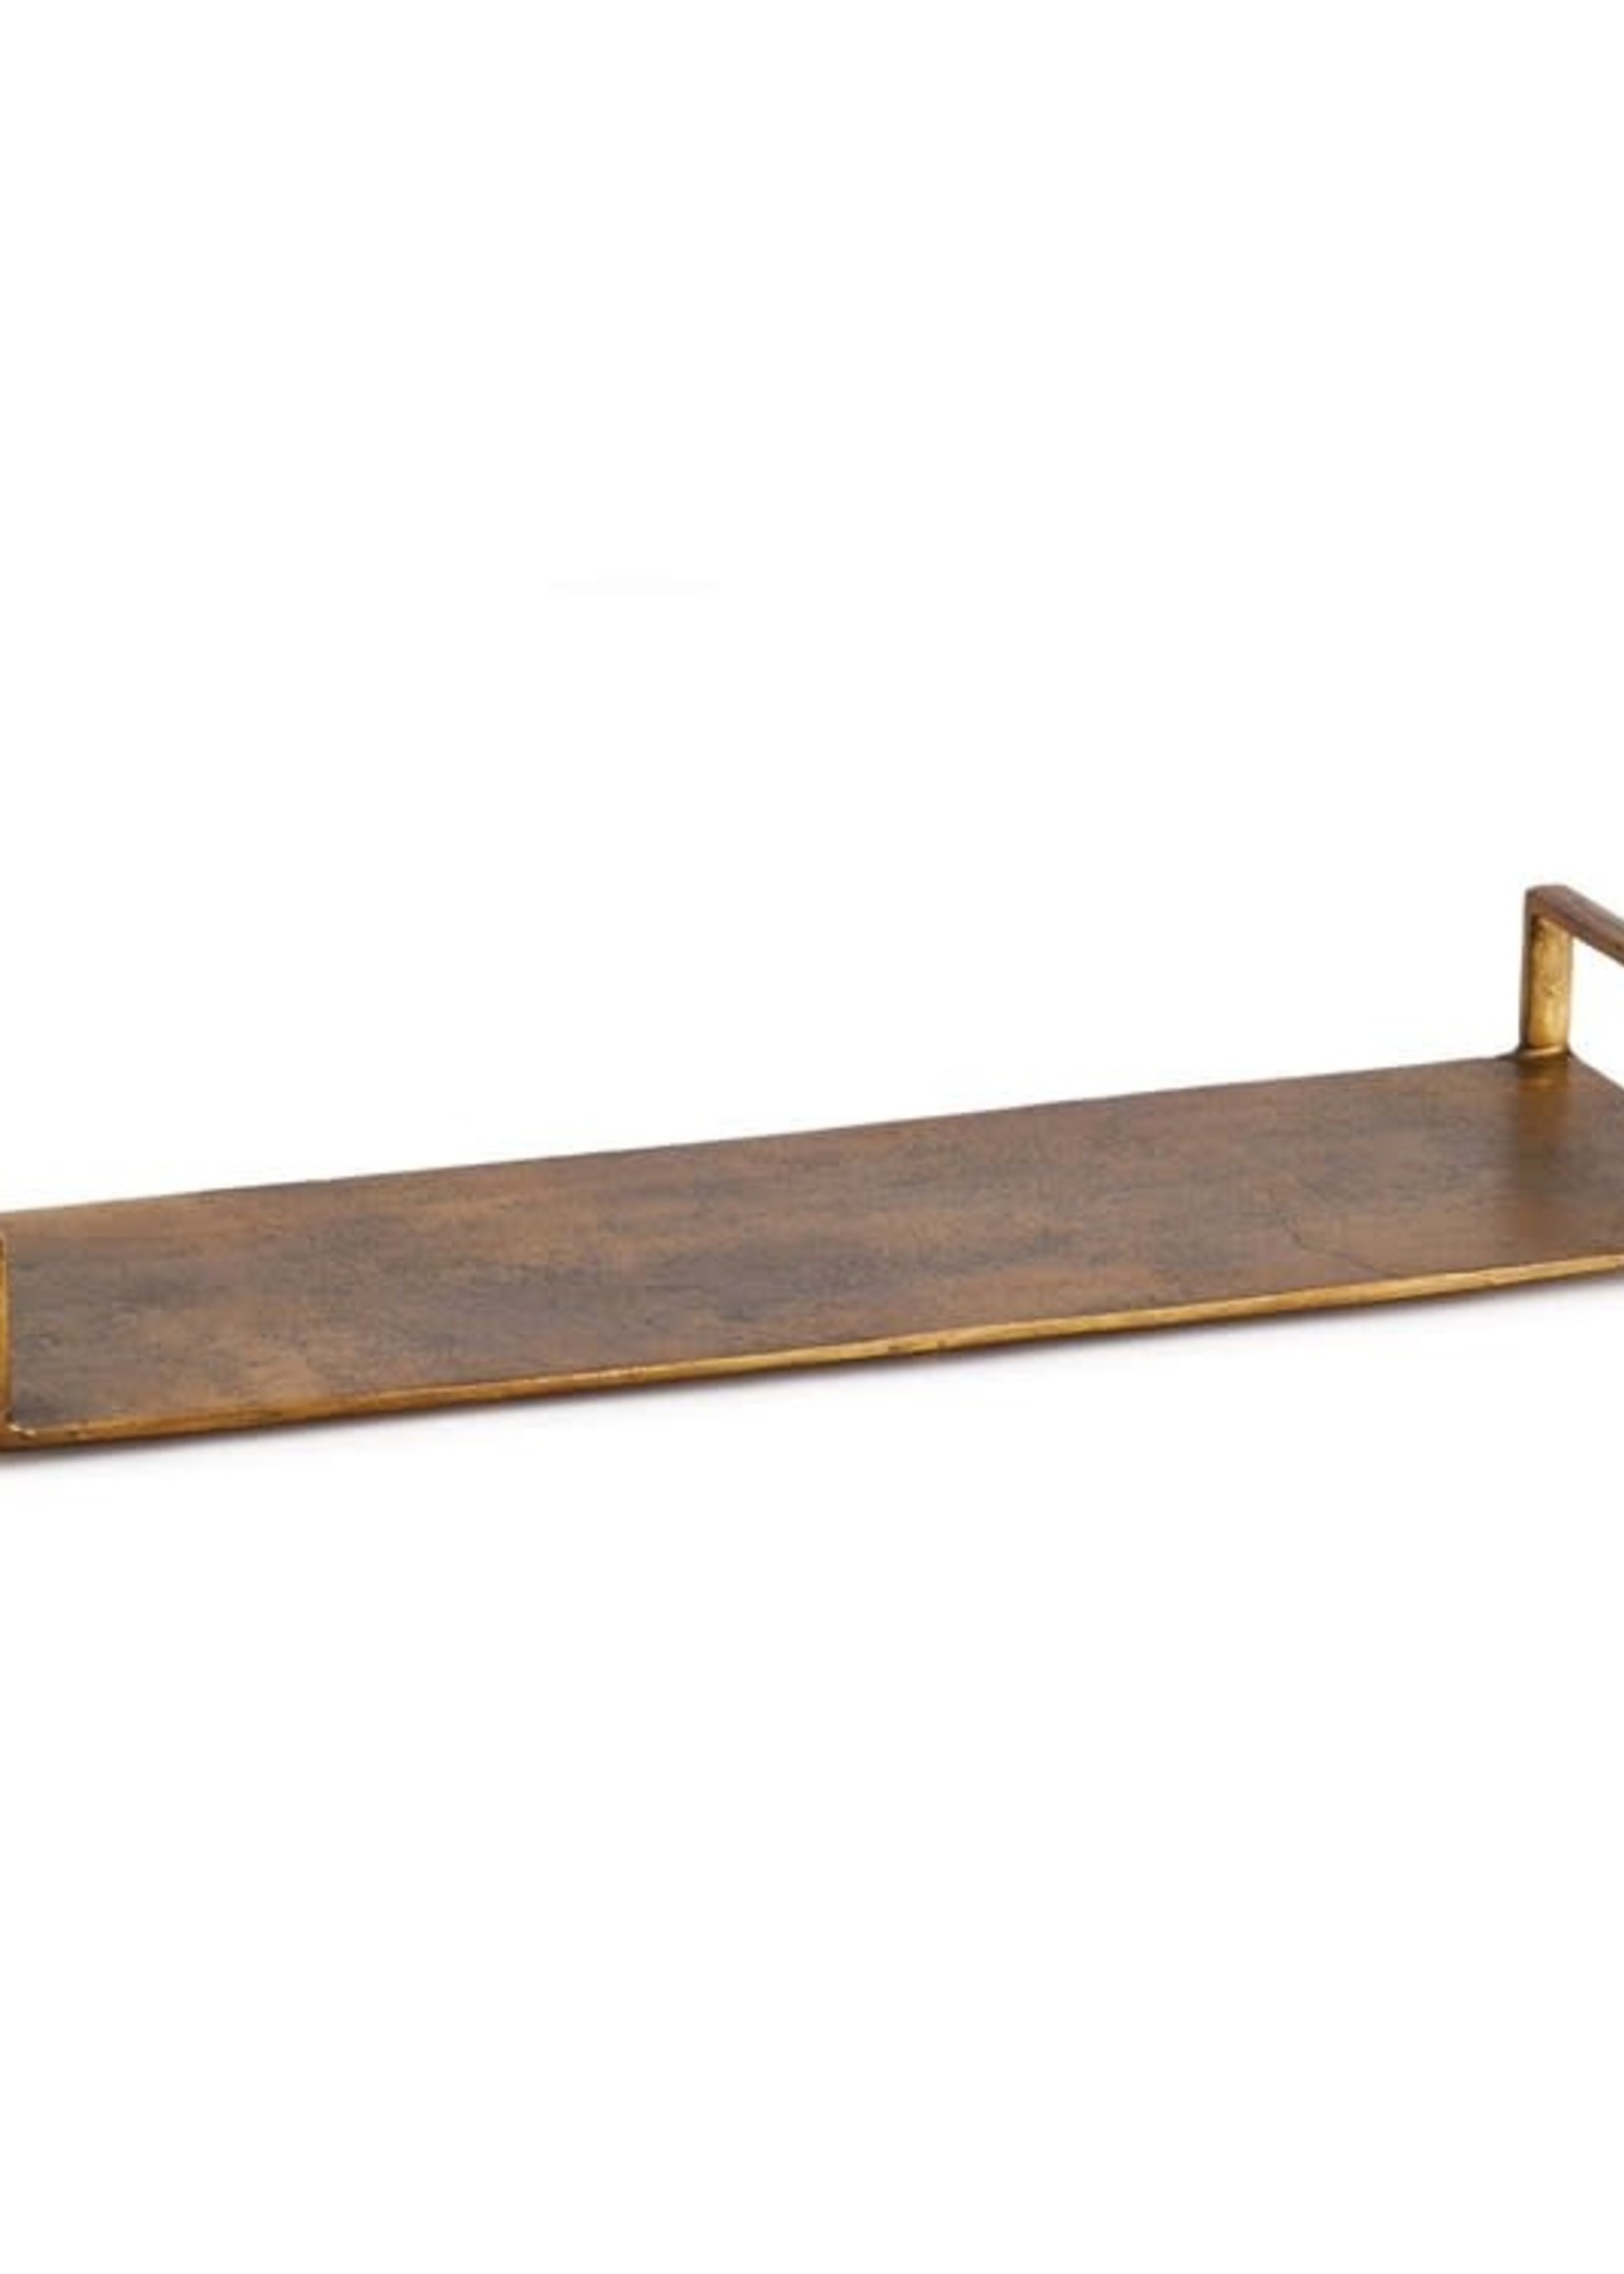 Cabot Rectangular Decorative Tray